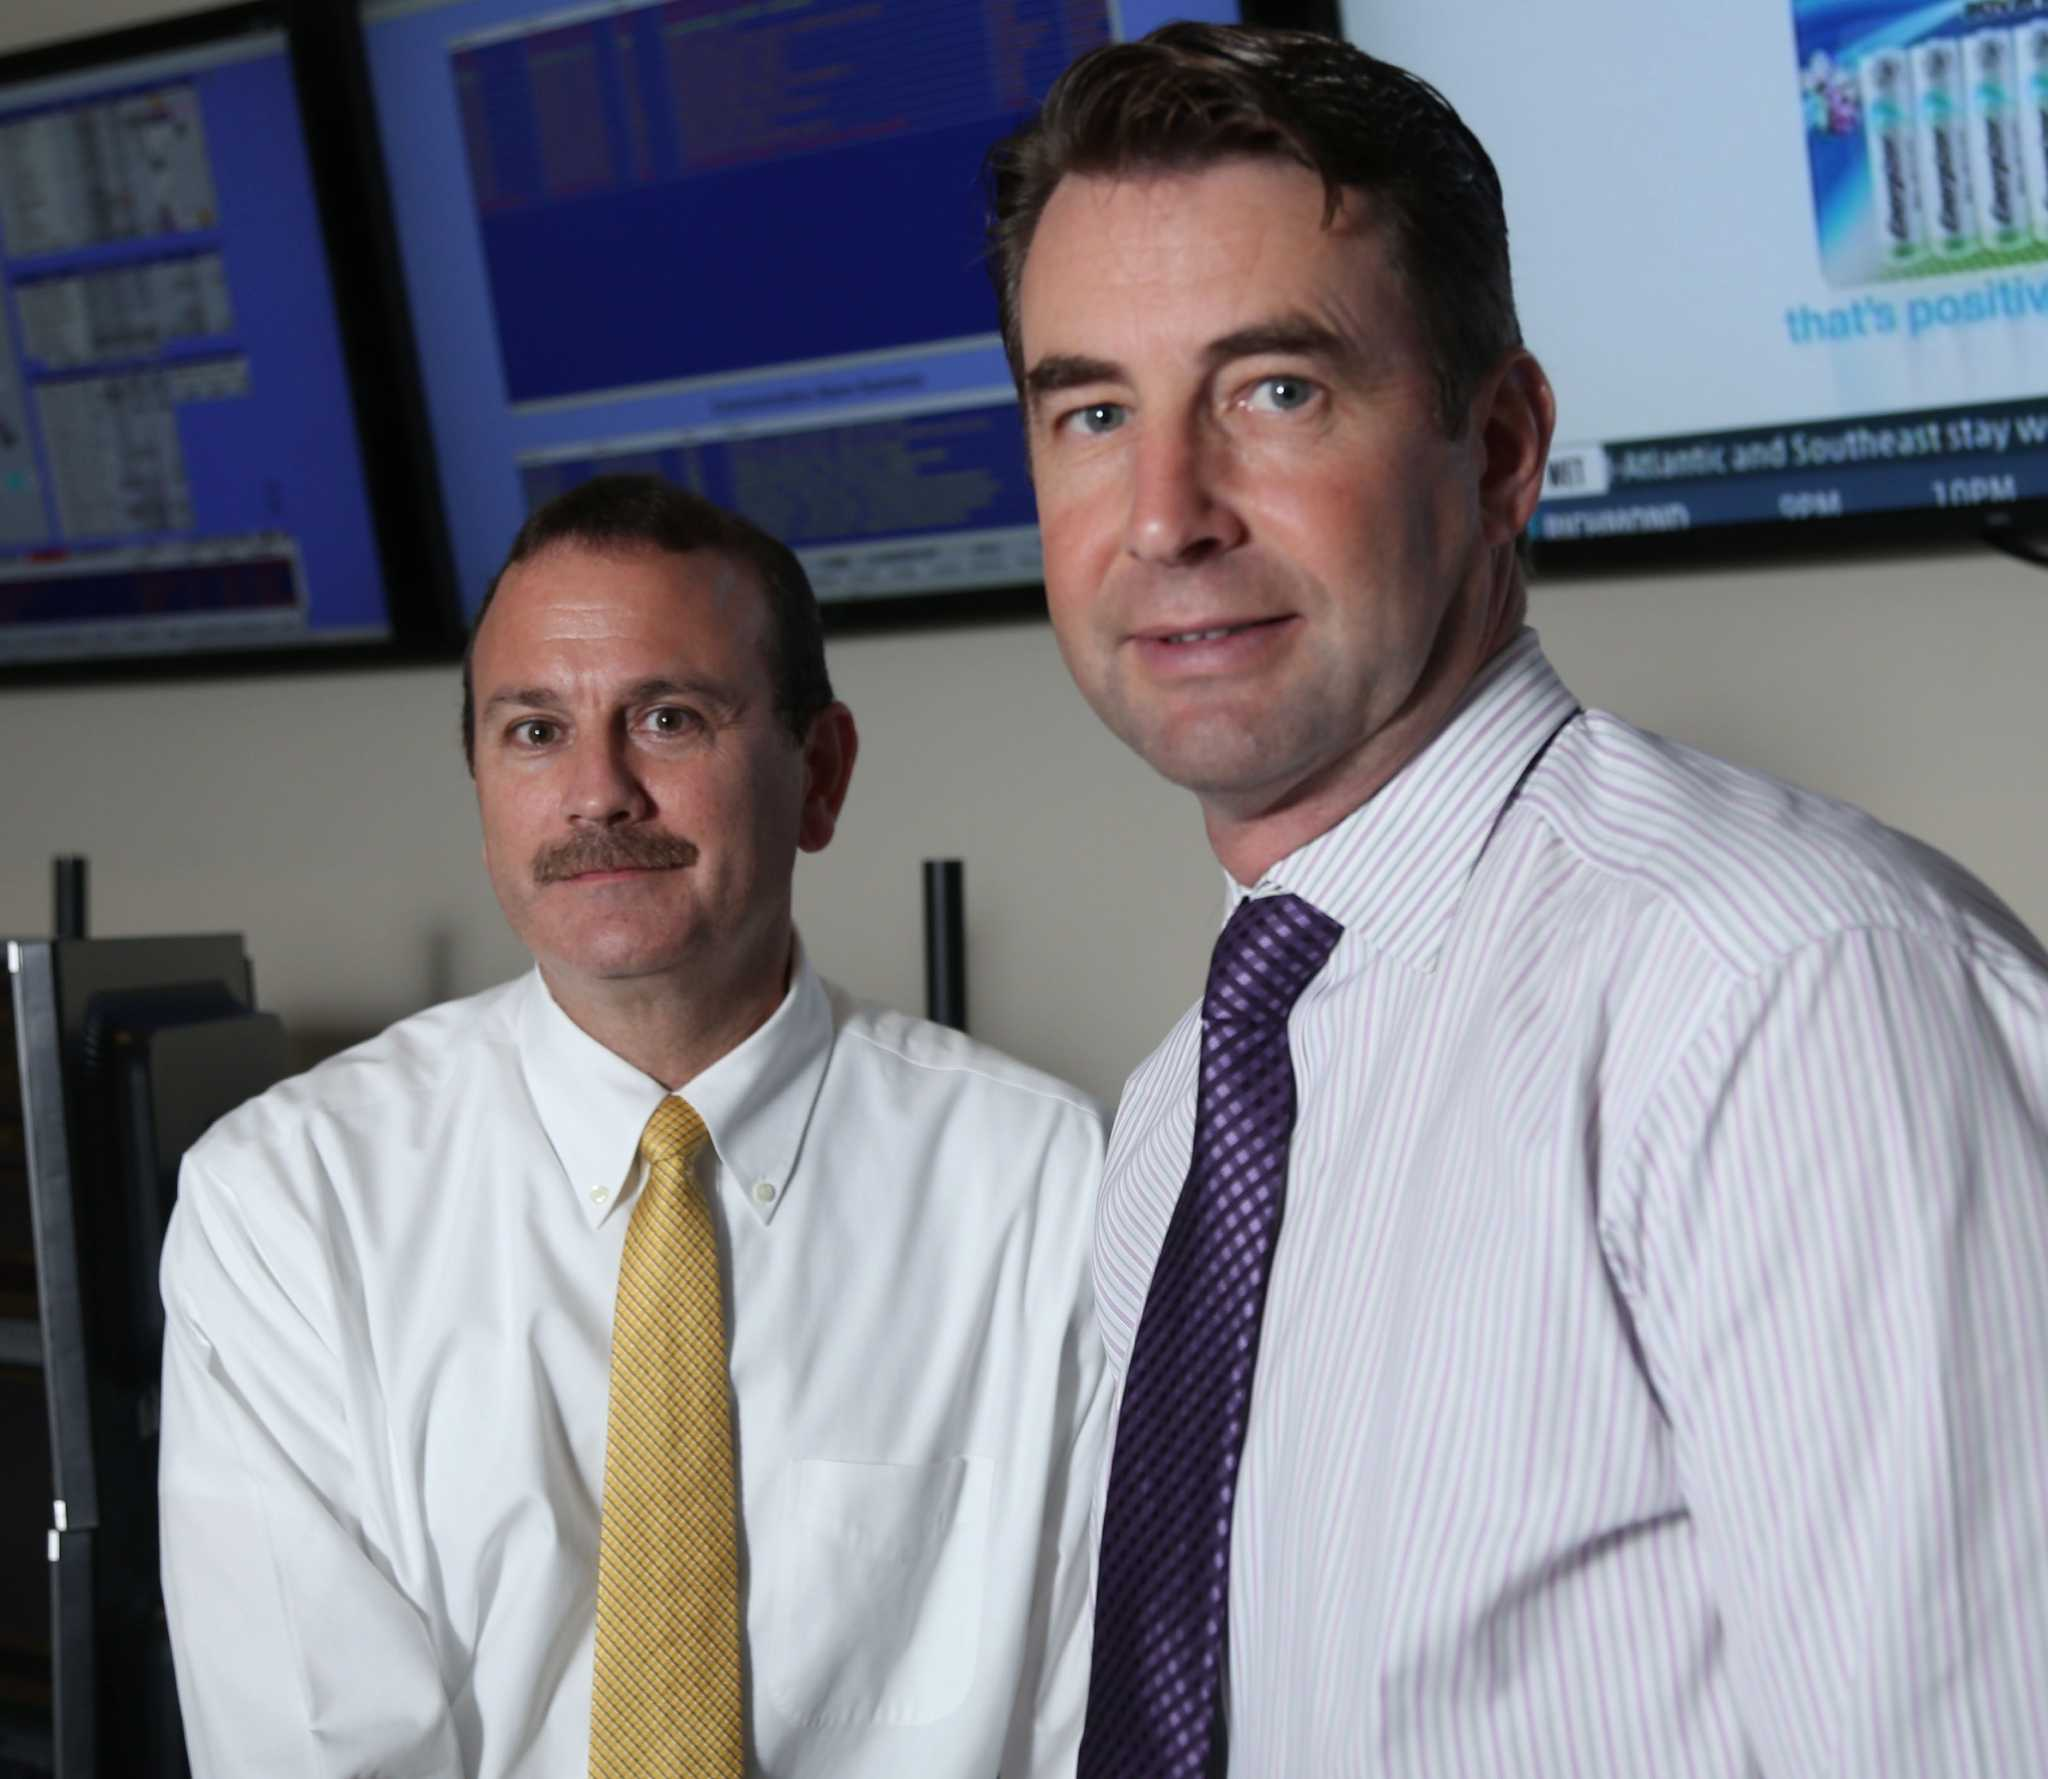 No. 3 public company: Enbridge - HoustonChronicle.com